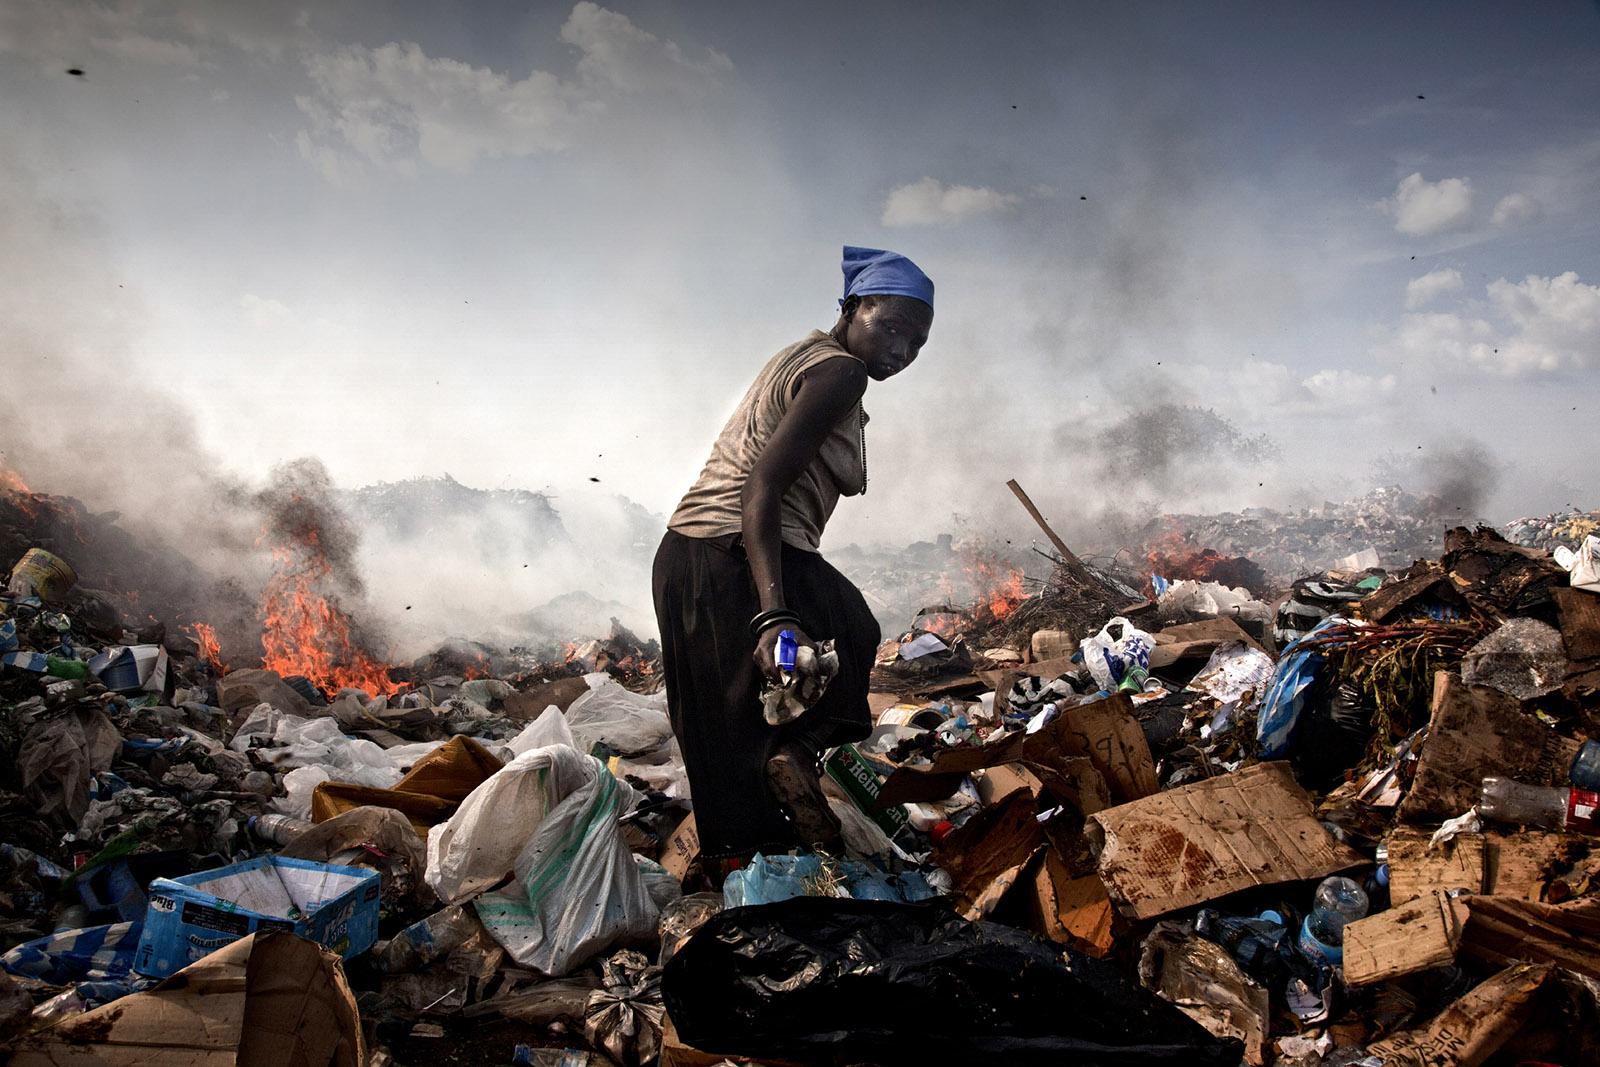 A woman walking through the landfill where she lives, Juba, South Sudan, 2010